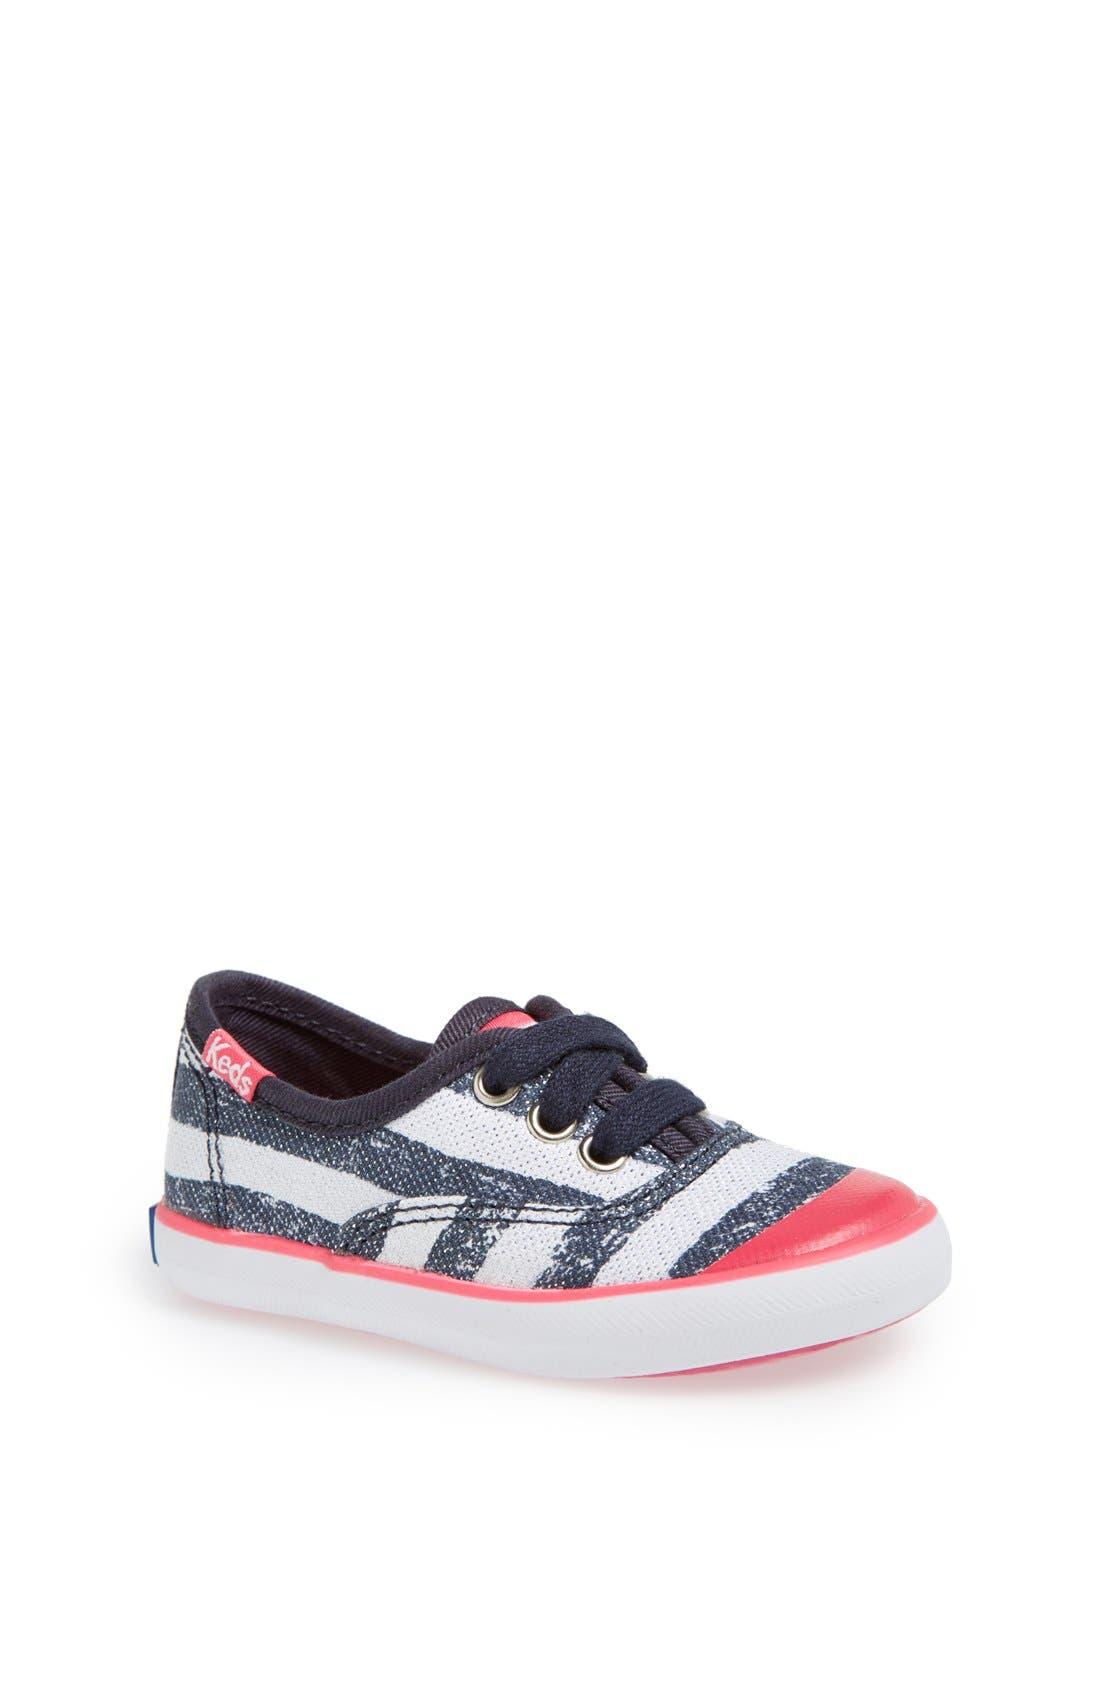 Alternate Image 1 Selected - Keds® 'Champion K' Sneaker (Walker & Toddler)